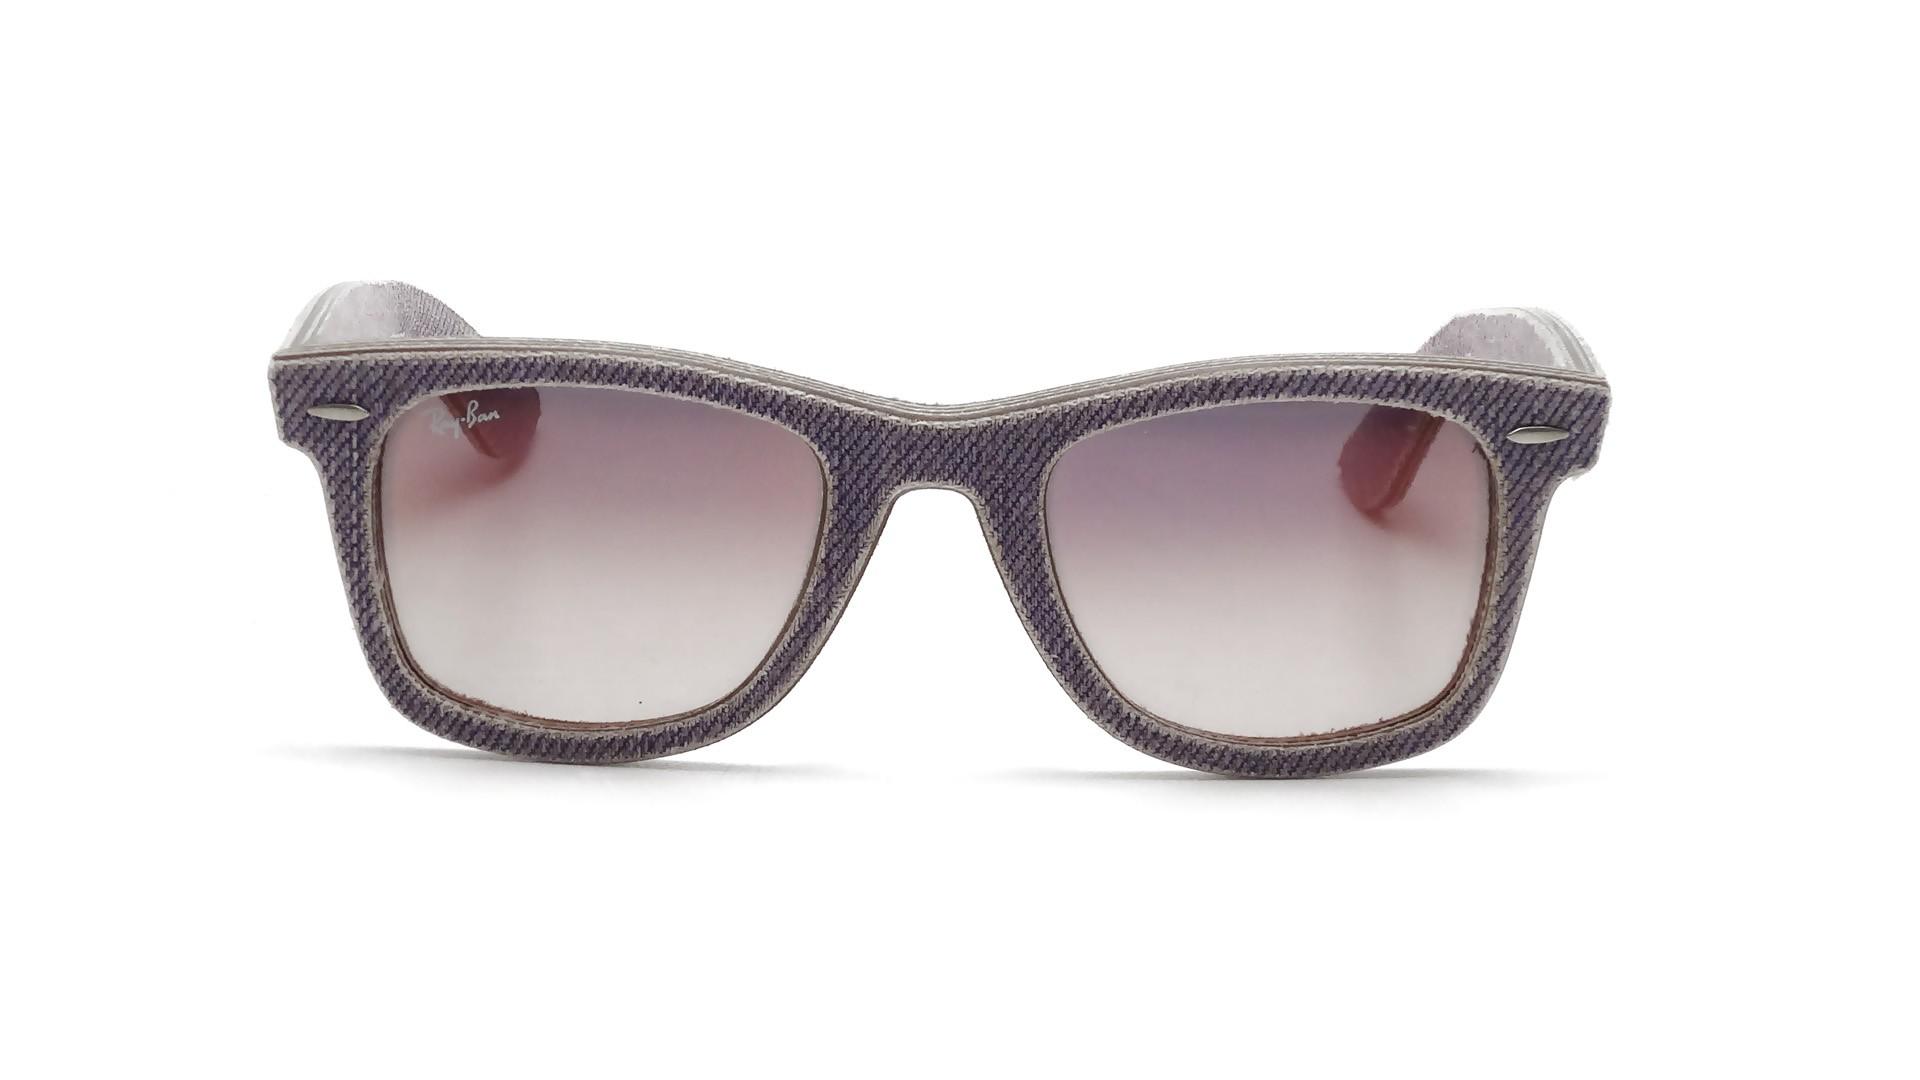 0efa53d0f5b5a Sunglasses Ray-Ban Original Wayfarer Denim Purple RB2140 1167 S5 50-18  Medium Gradient